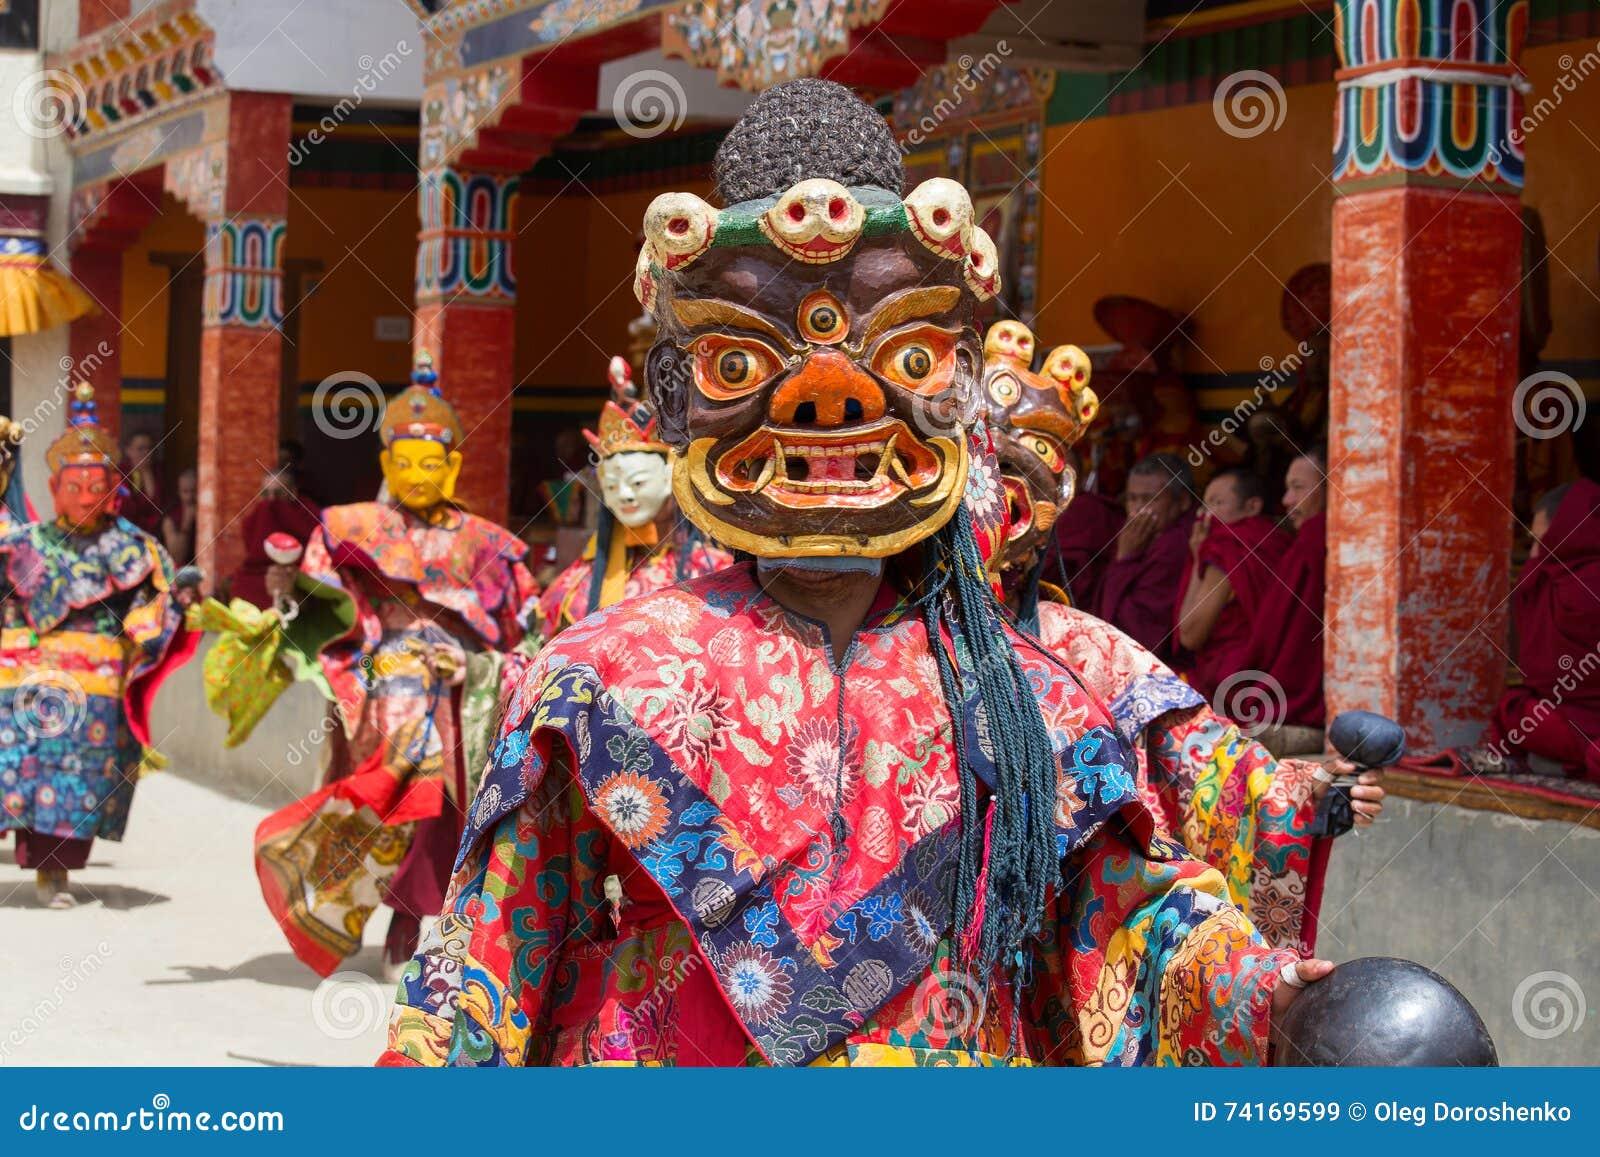 333708f82 LAMAYURU MONASTERY, INDIA - JUNE 13, 2015 : buddhist lamas dressed in  mystical mask dancing Tsam mystery dance in time of Yuru Kabgyat Buddhist  festival at ...